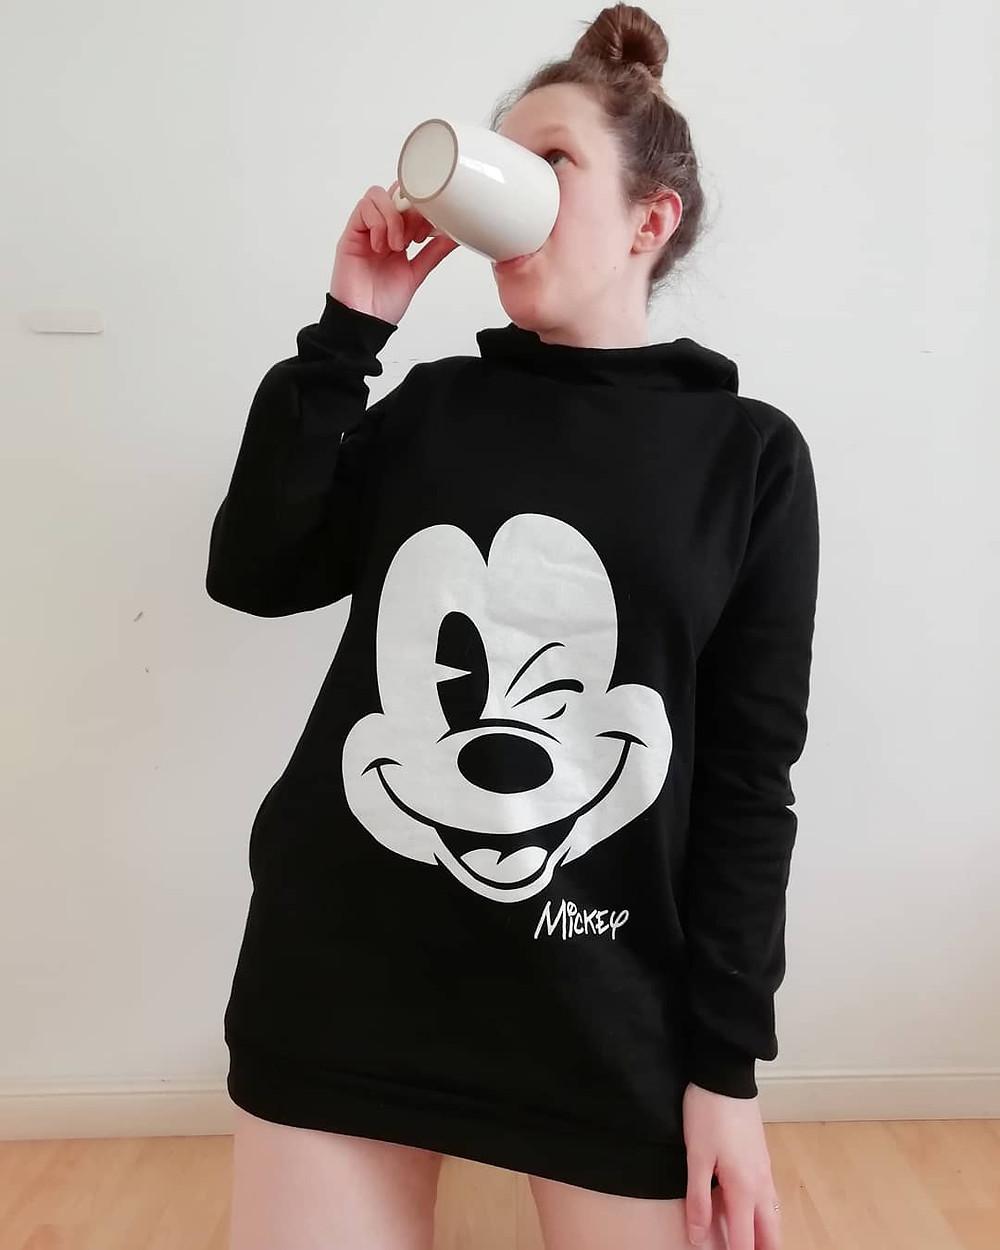 Buzo grande mickey color negro | buzos de mickey mouse para mujer